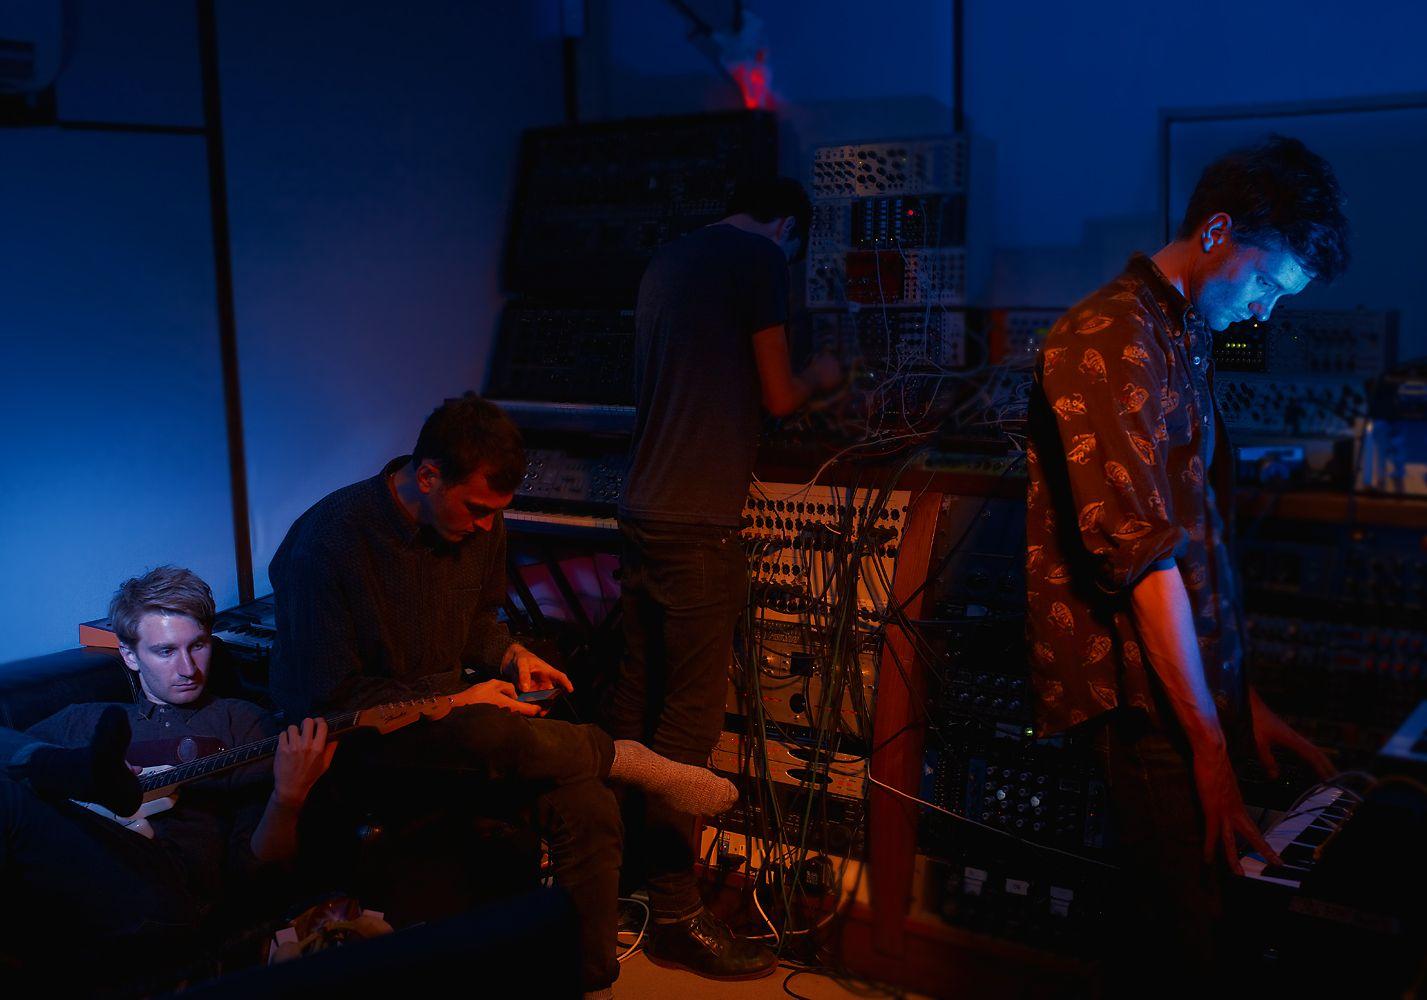 Dave Bayley, Joe Seaward, and Drew Macfarlane from Glass Animals